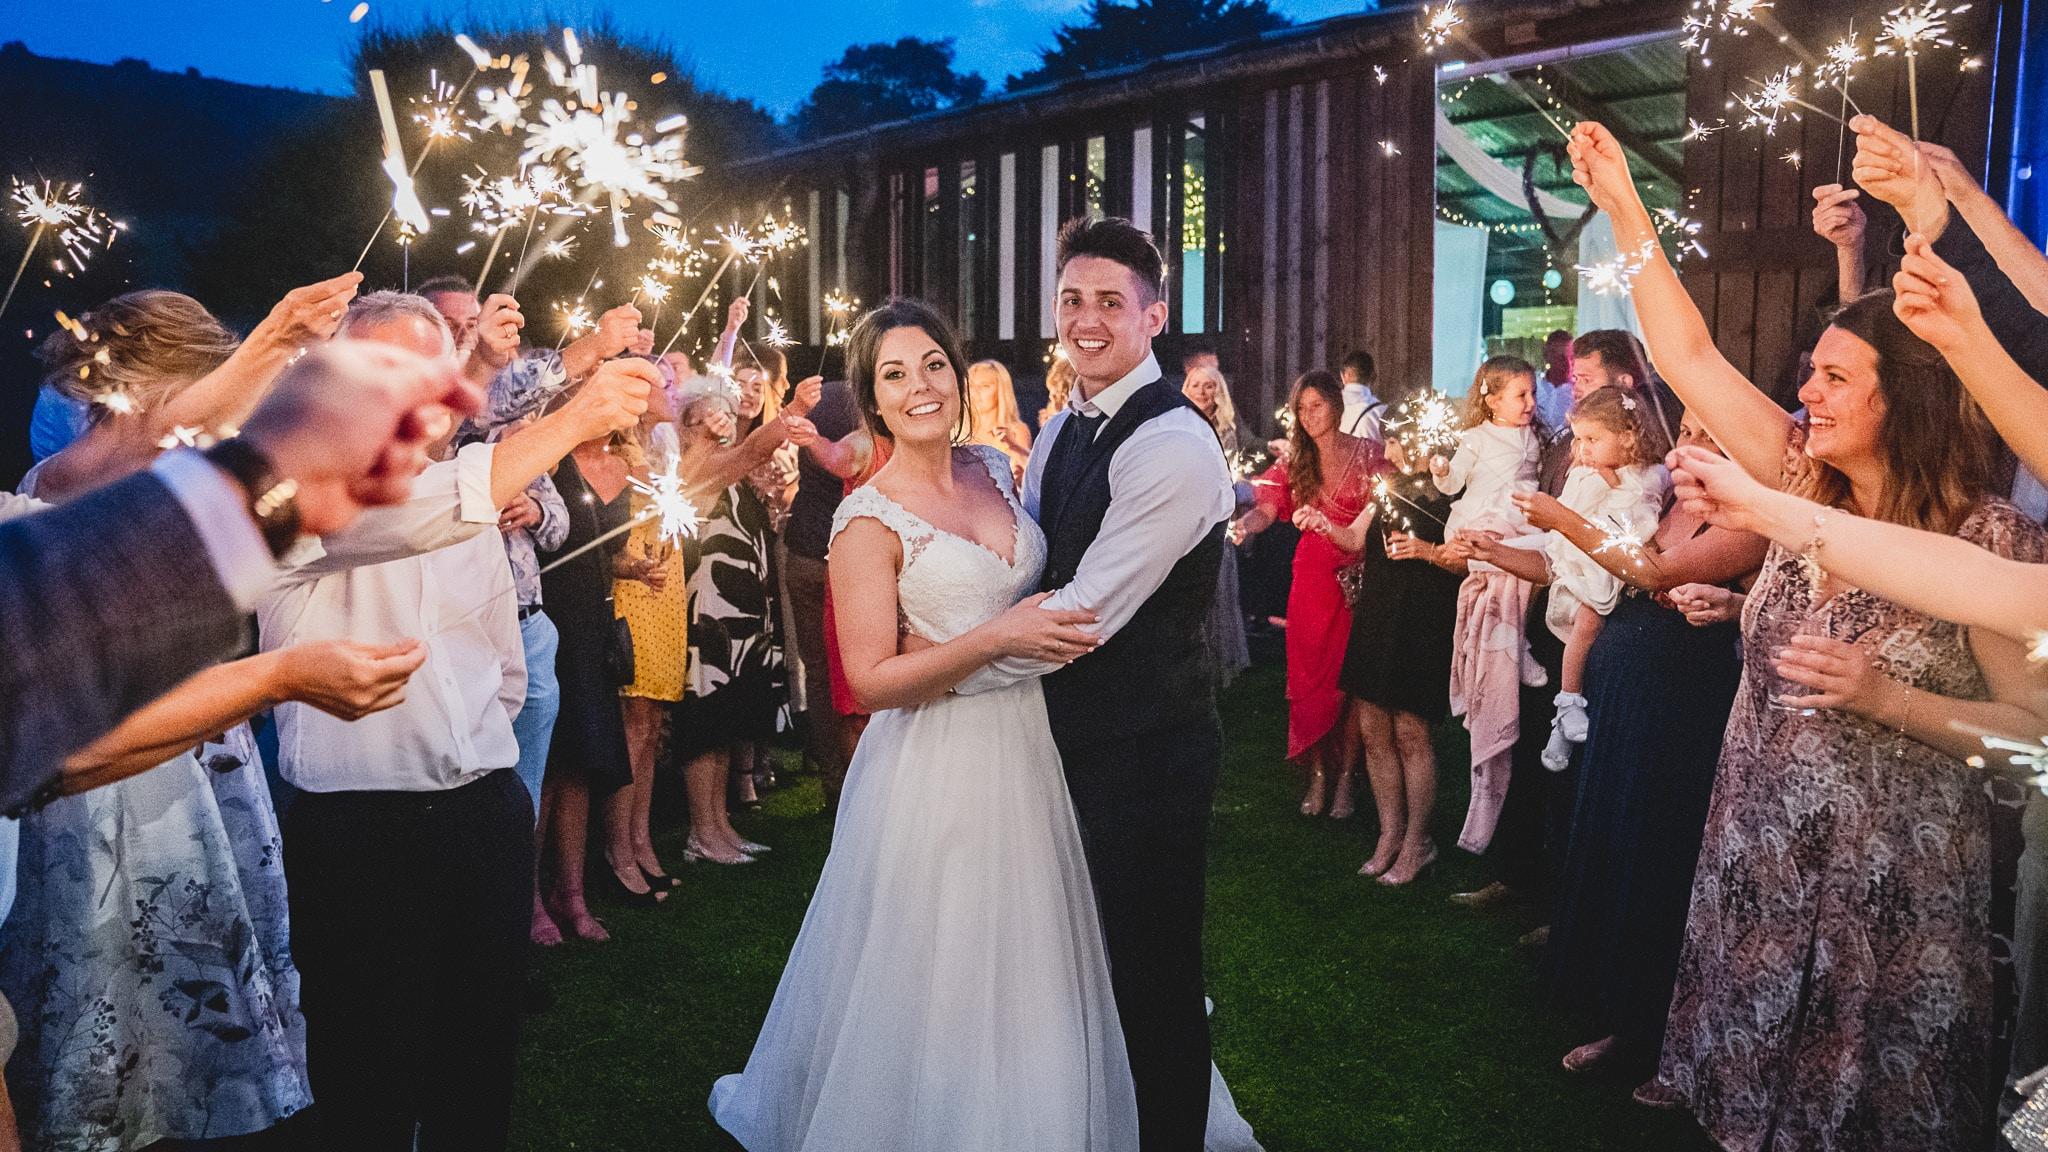 wedding sparkers at sugarloaf barn, Abergavenny